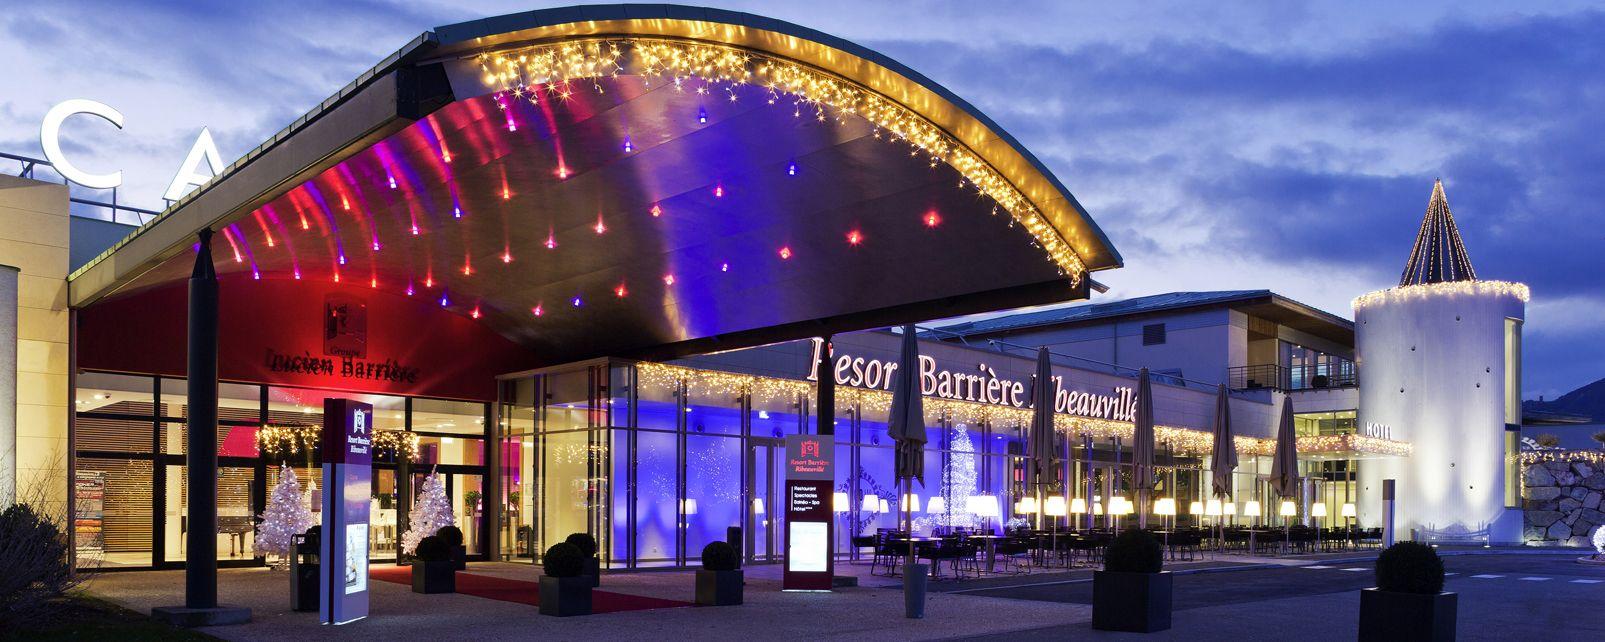 Hôtel Resort Barrière Ribeauvillé